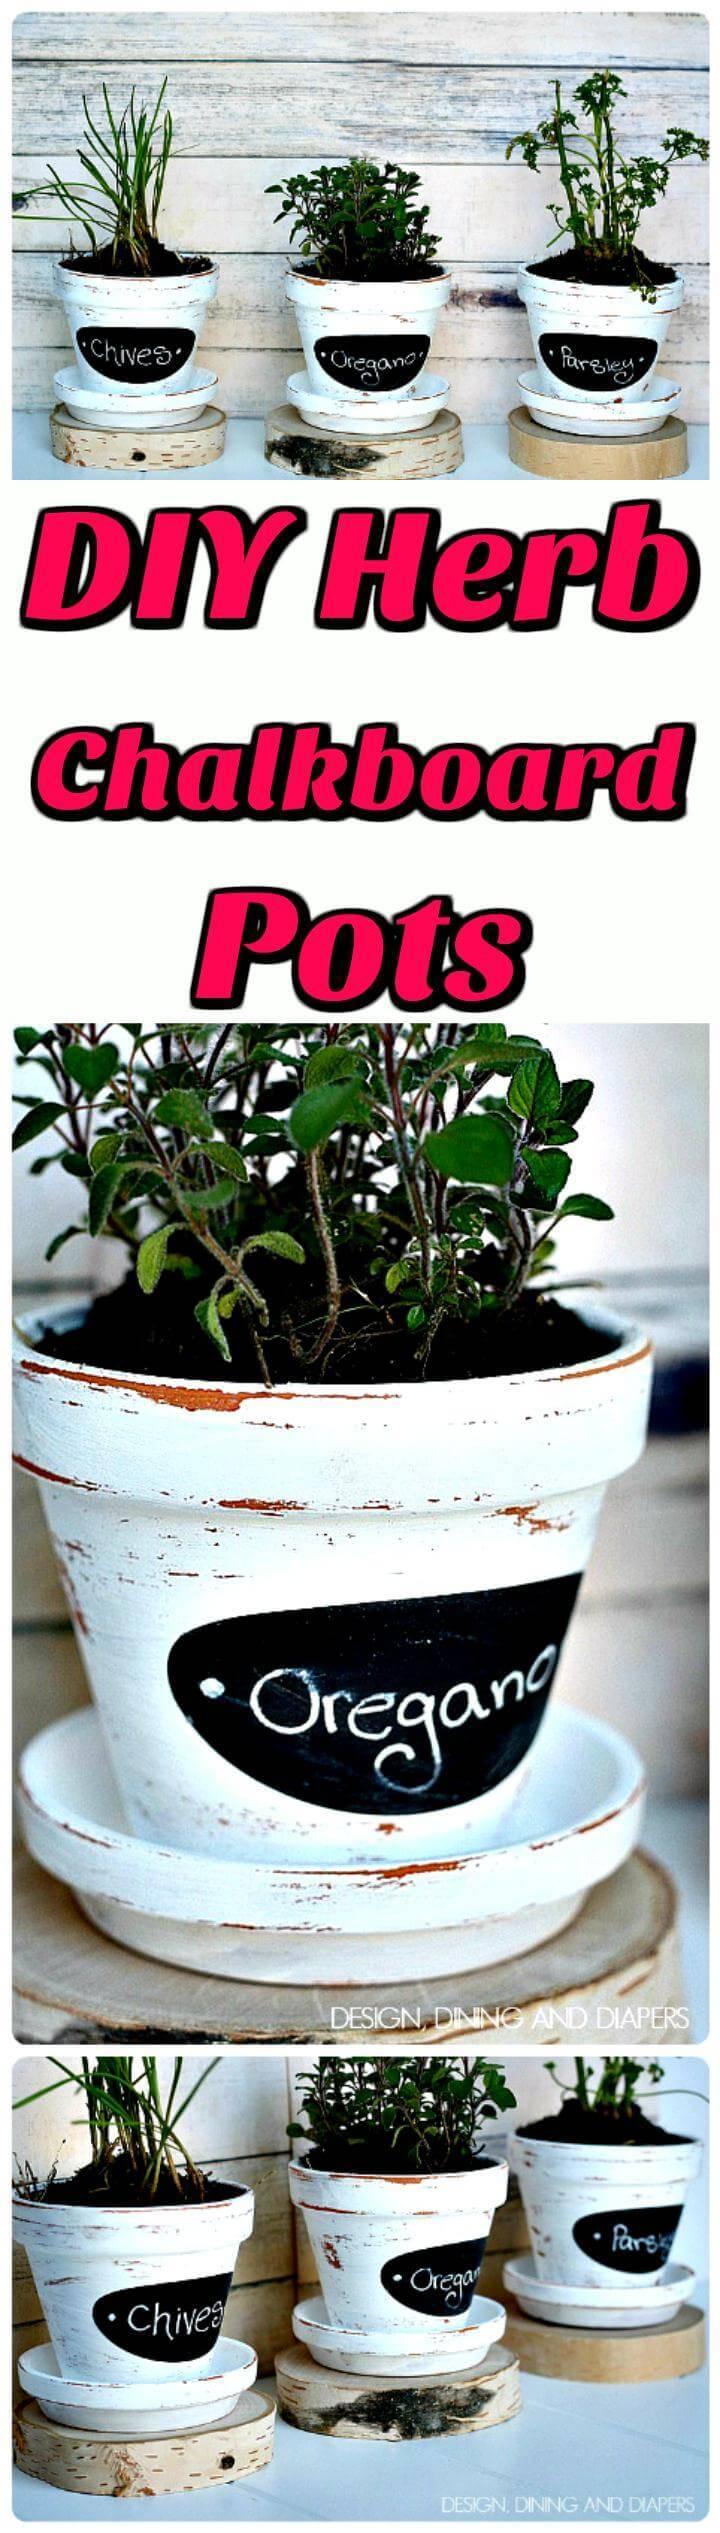 DIY herb chalkboard pots